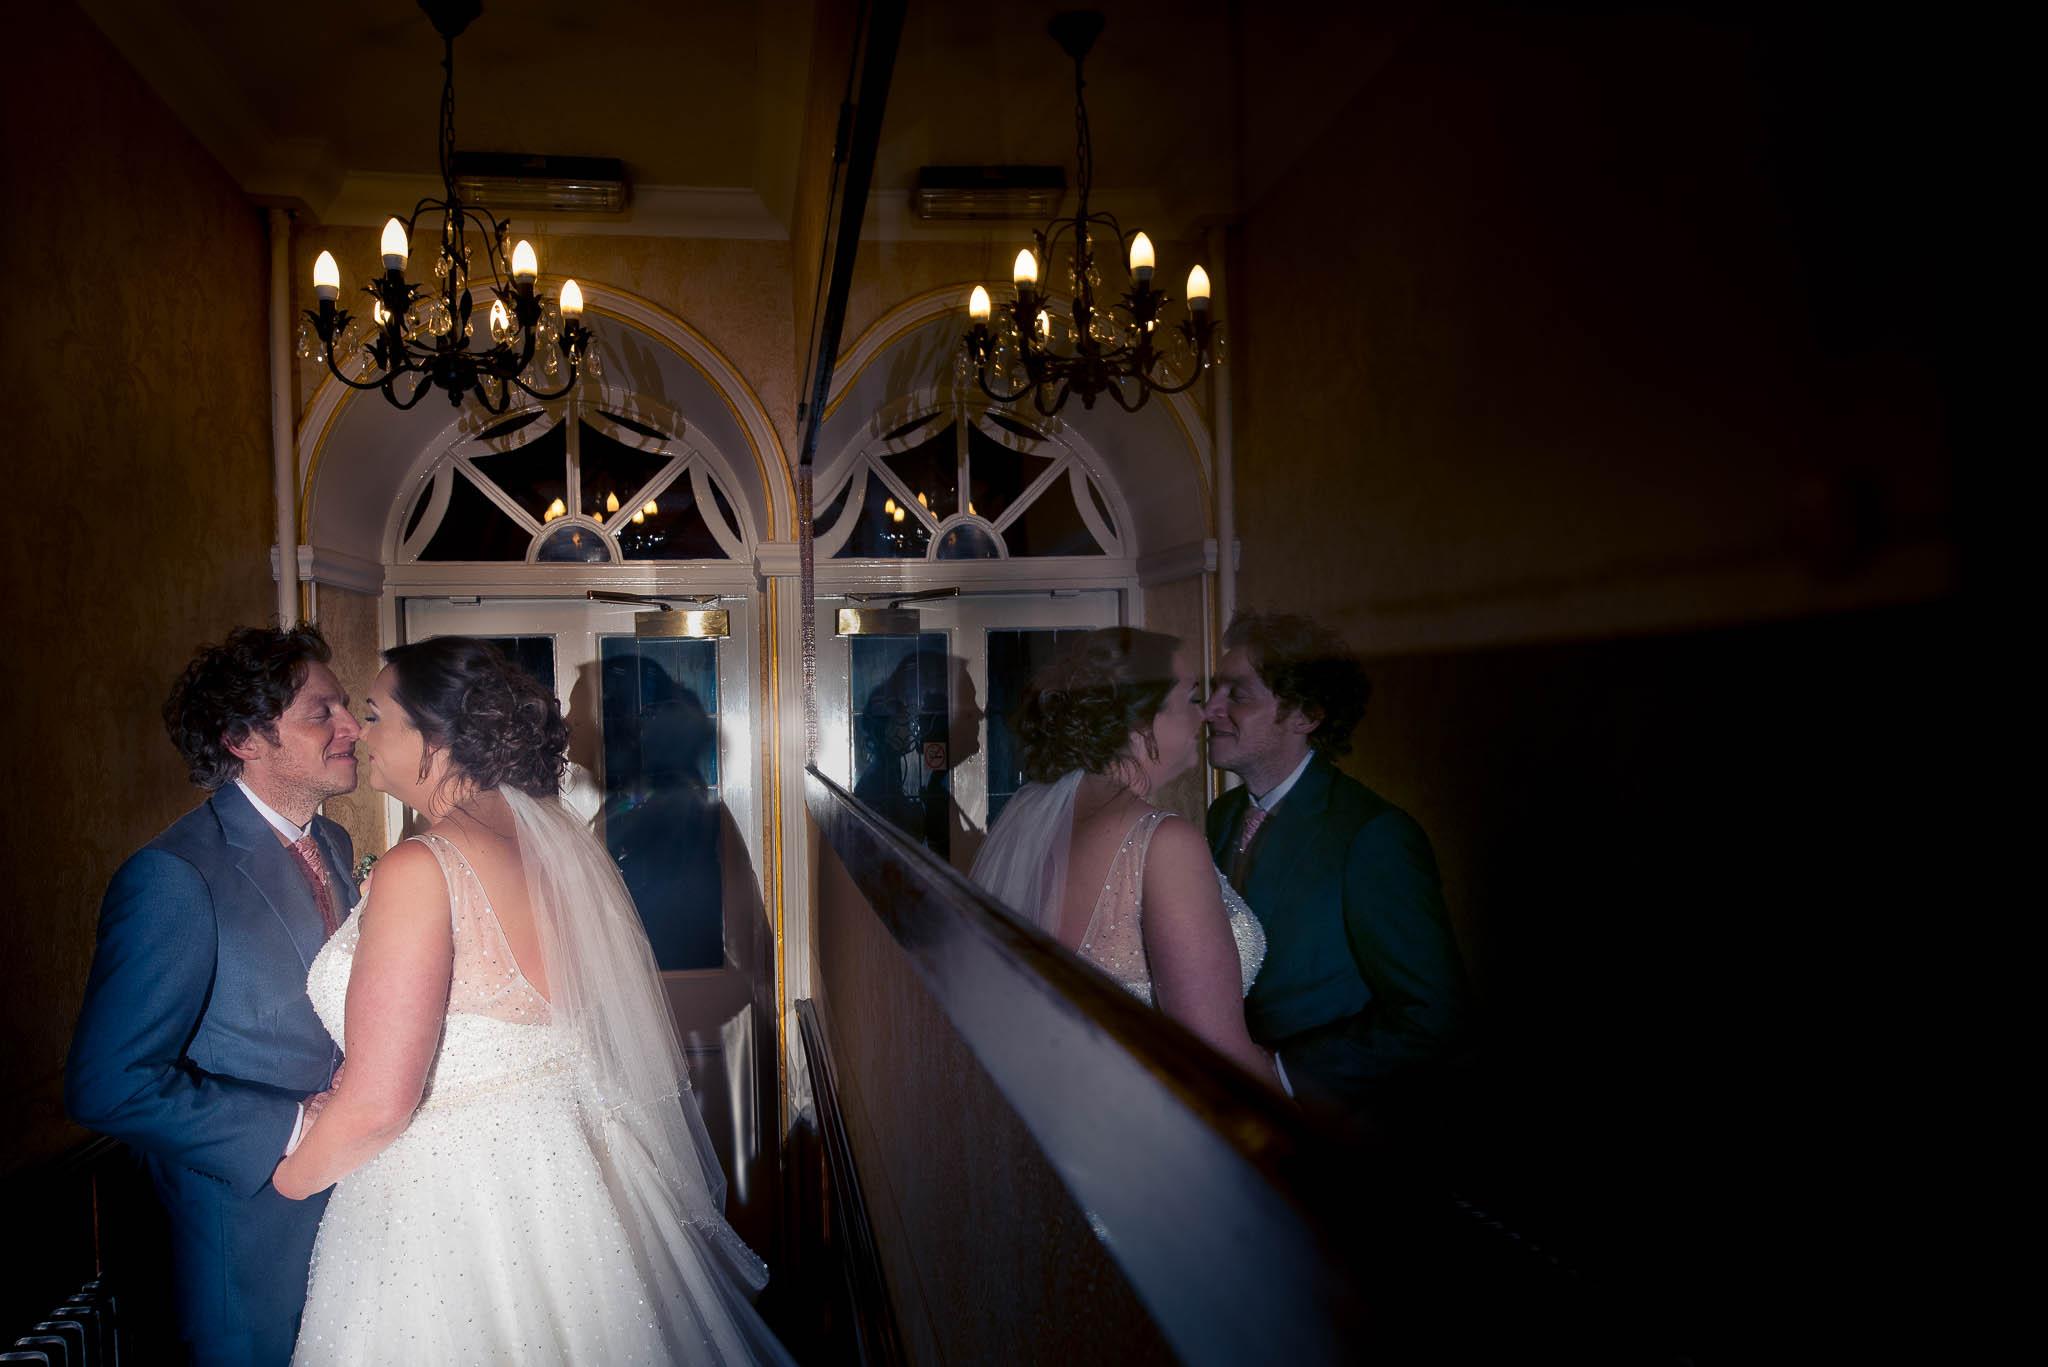 Lewis & Faye - Rogerthorpe Manor Wedding